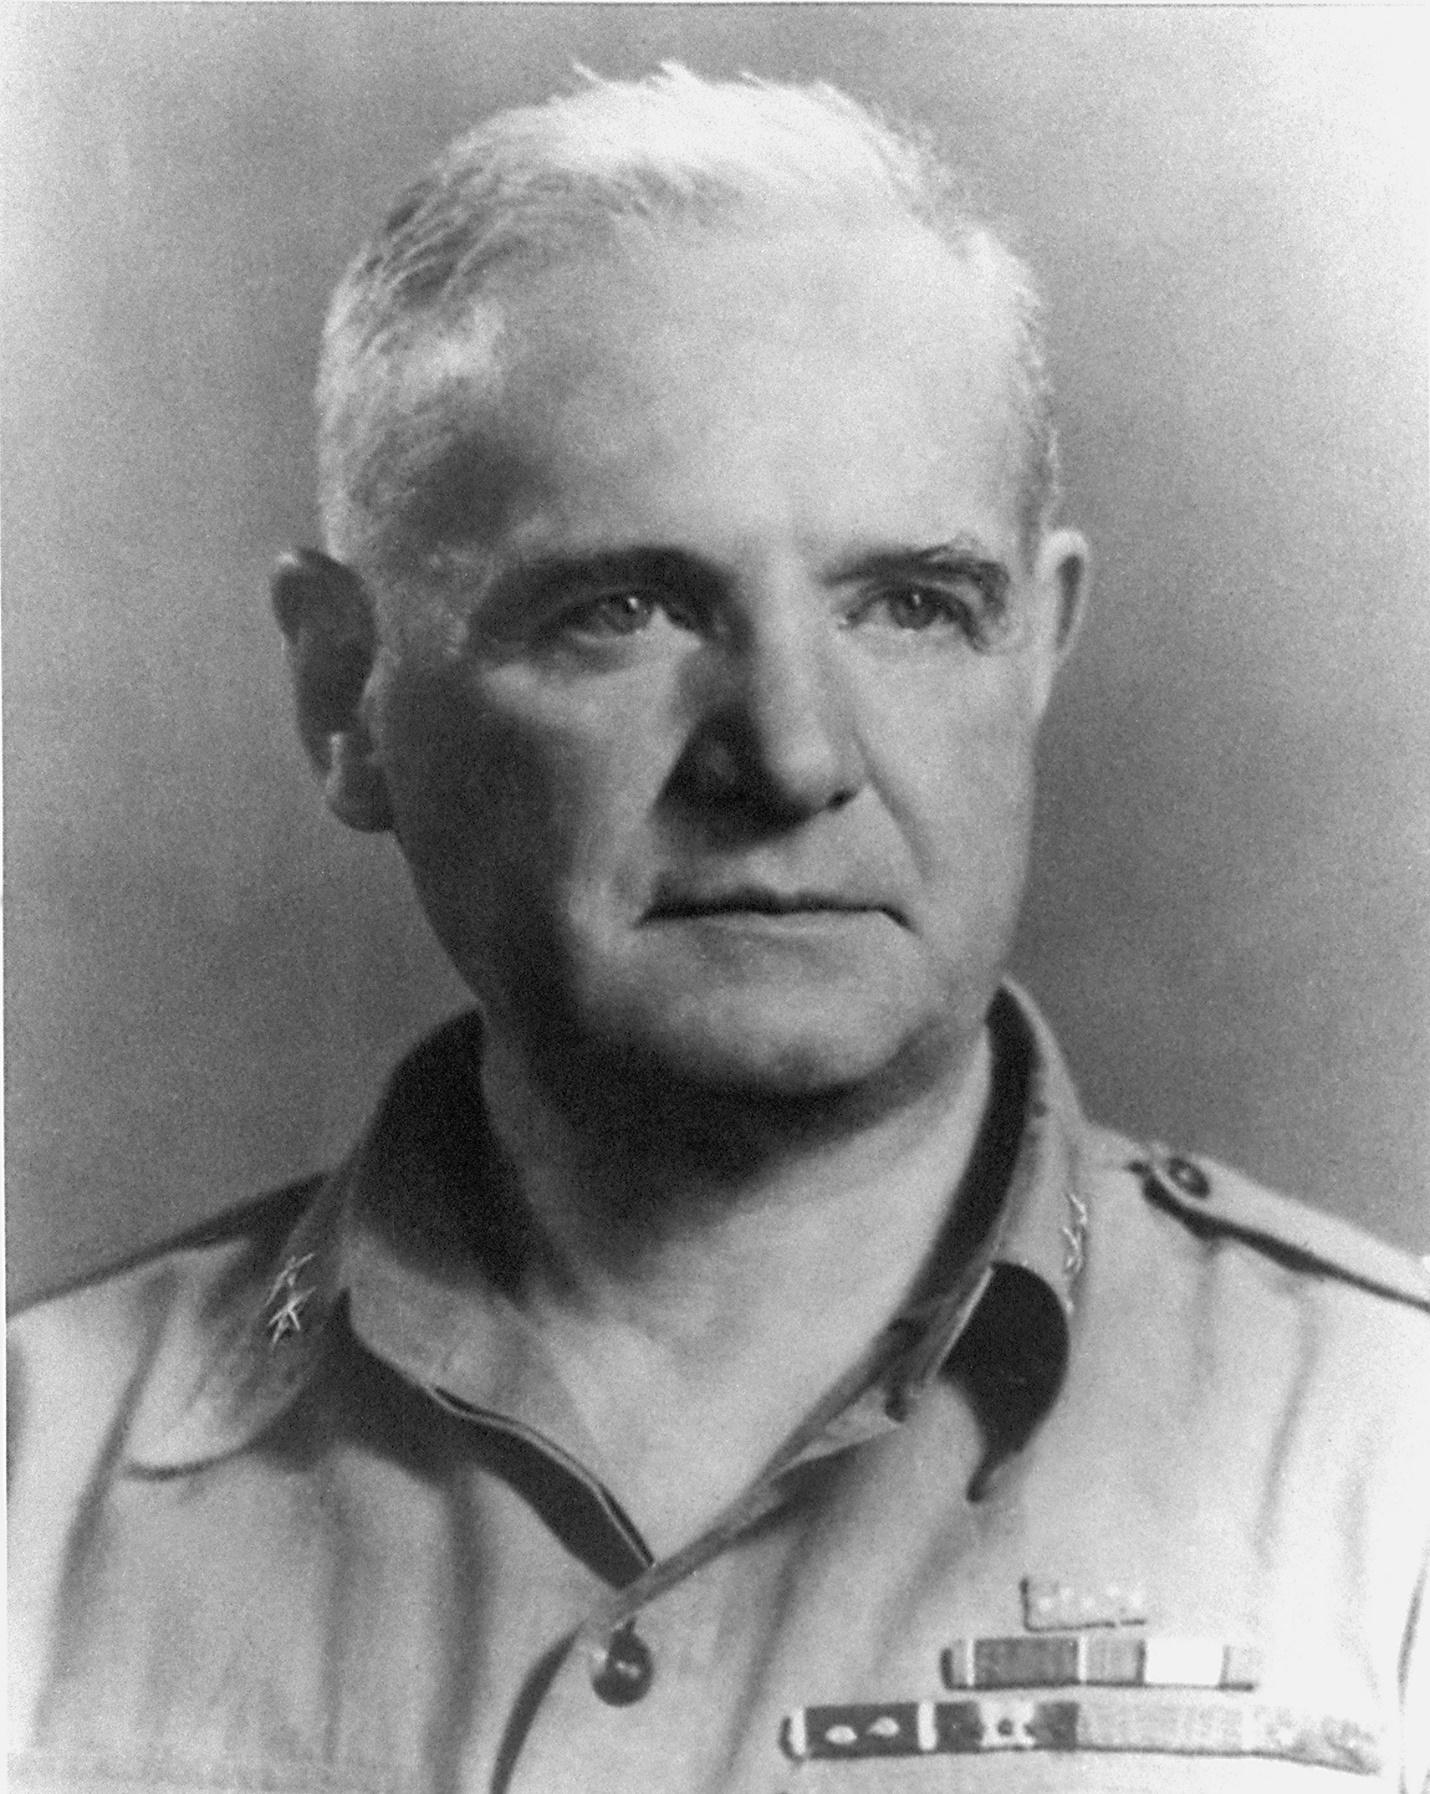 Maj. Gen. William J. Donovan when he headed the Office of Strategic Services. Courtesy CIA photo